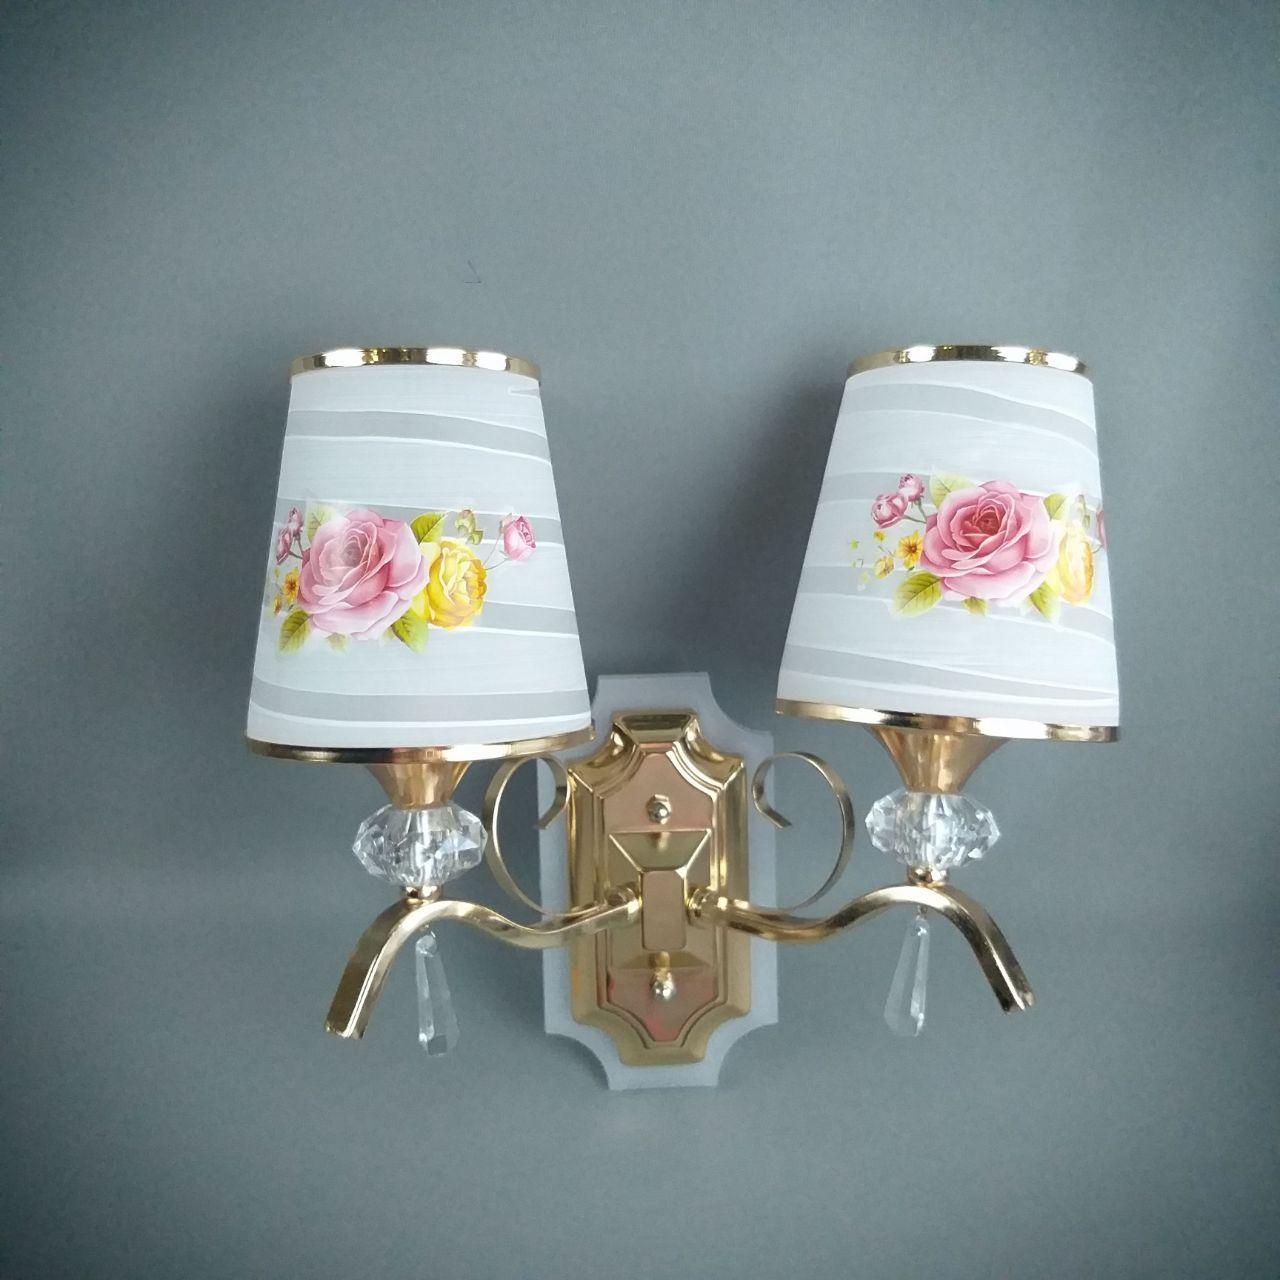 Бра на дві лампи HQ-8245/2W